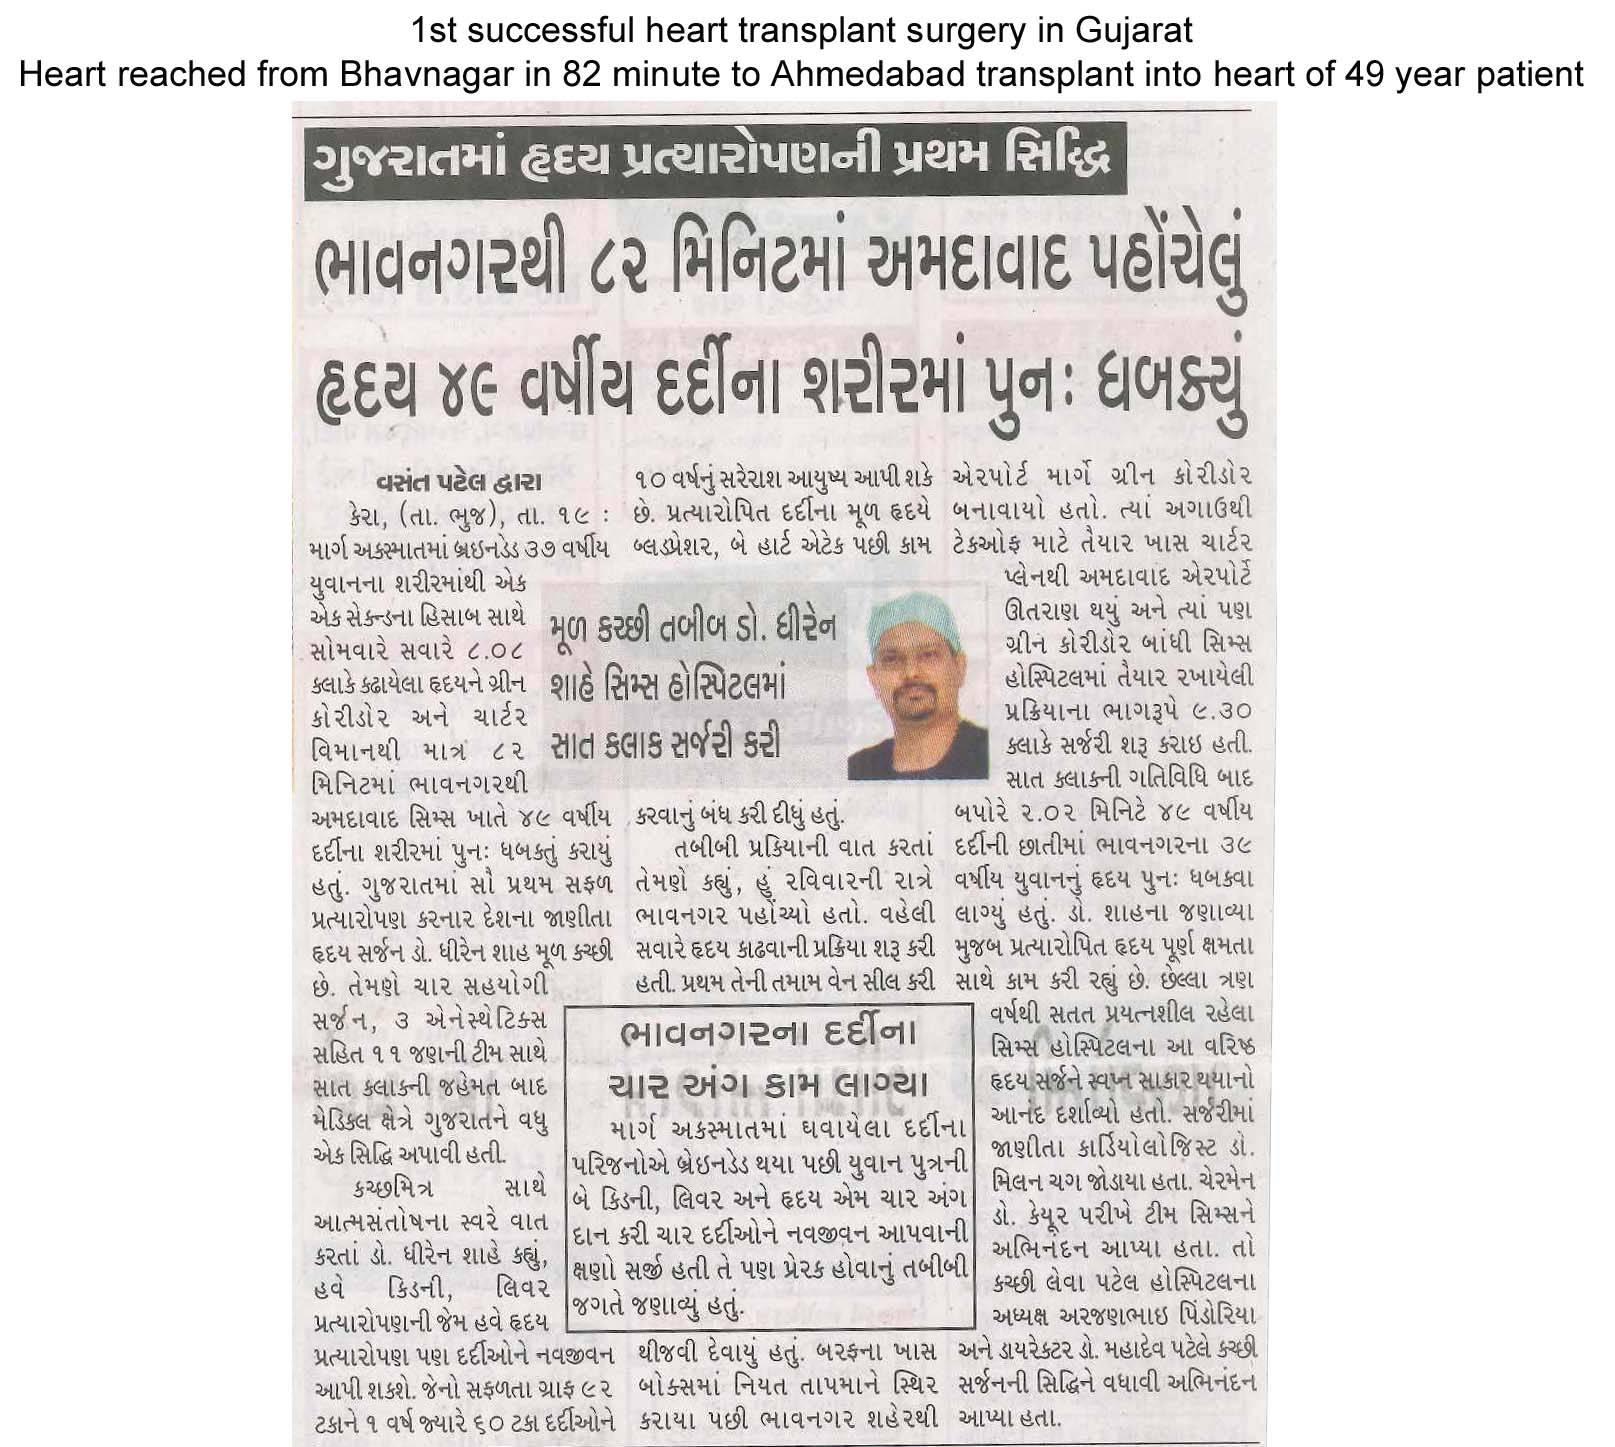 Kutch Uday (Bhuj)_CIMS (1st Heart transplant in Gujarat)_20.12.16_Pg 03